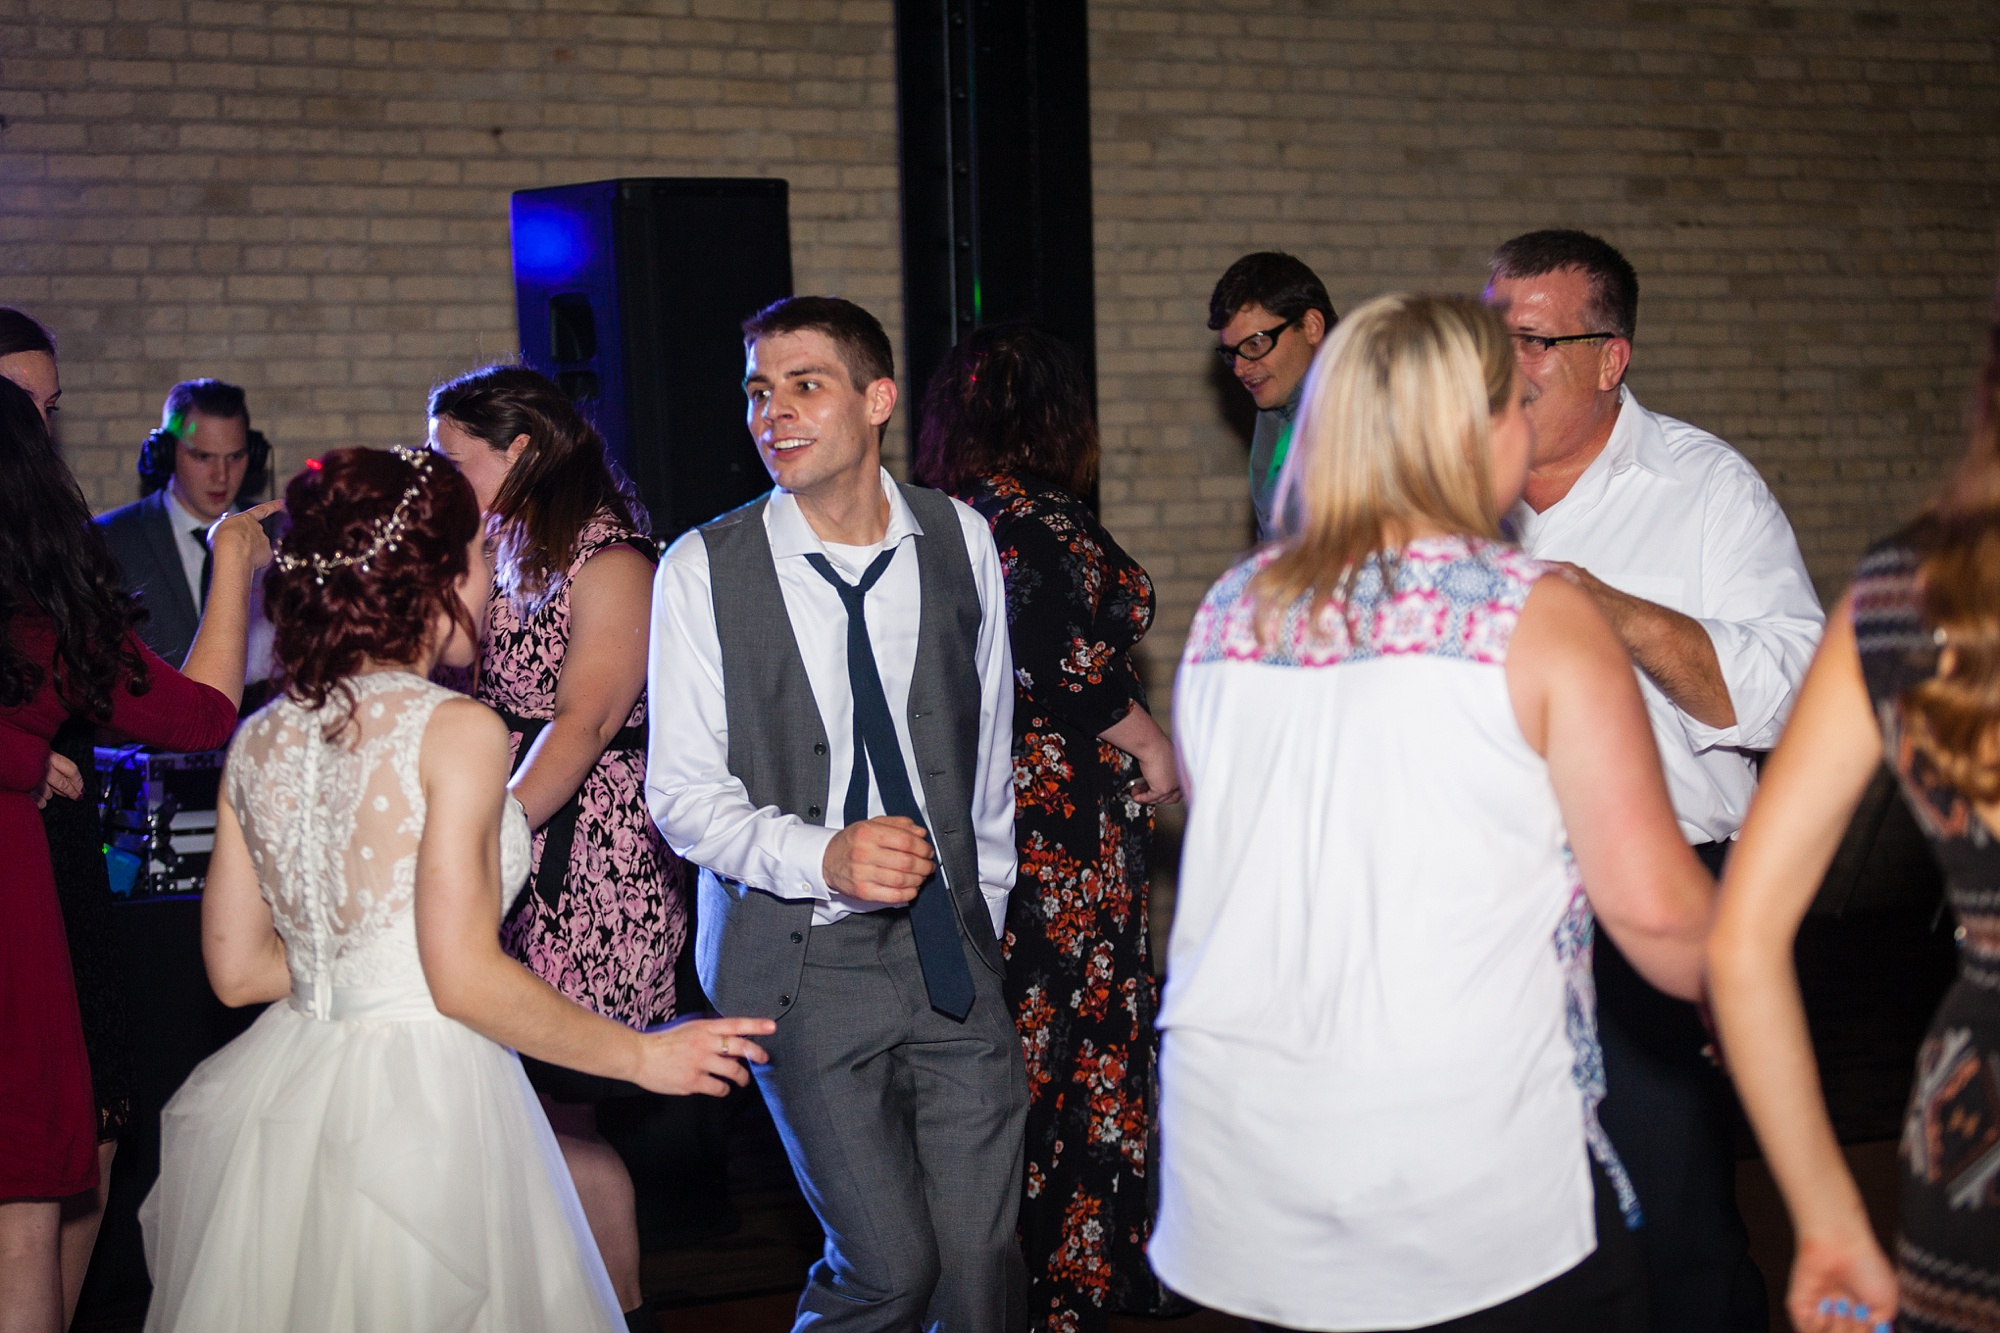 Brandon_Shafer_Photography_Lauren_Ethan_New_Vintage_Place_Grand_Rapids_Wedding_0057.jpg